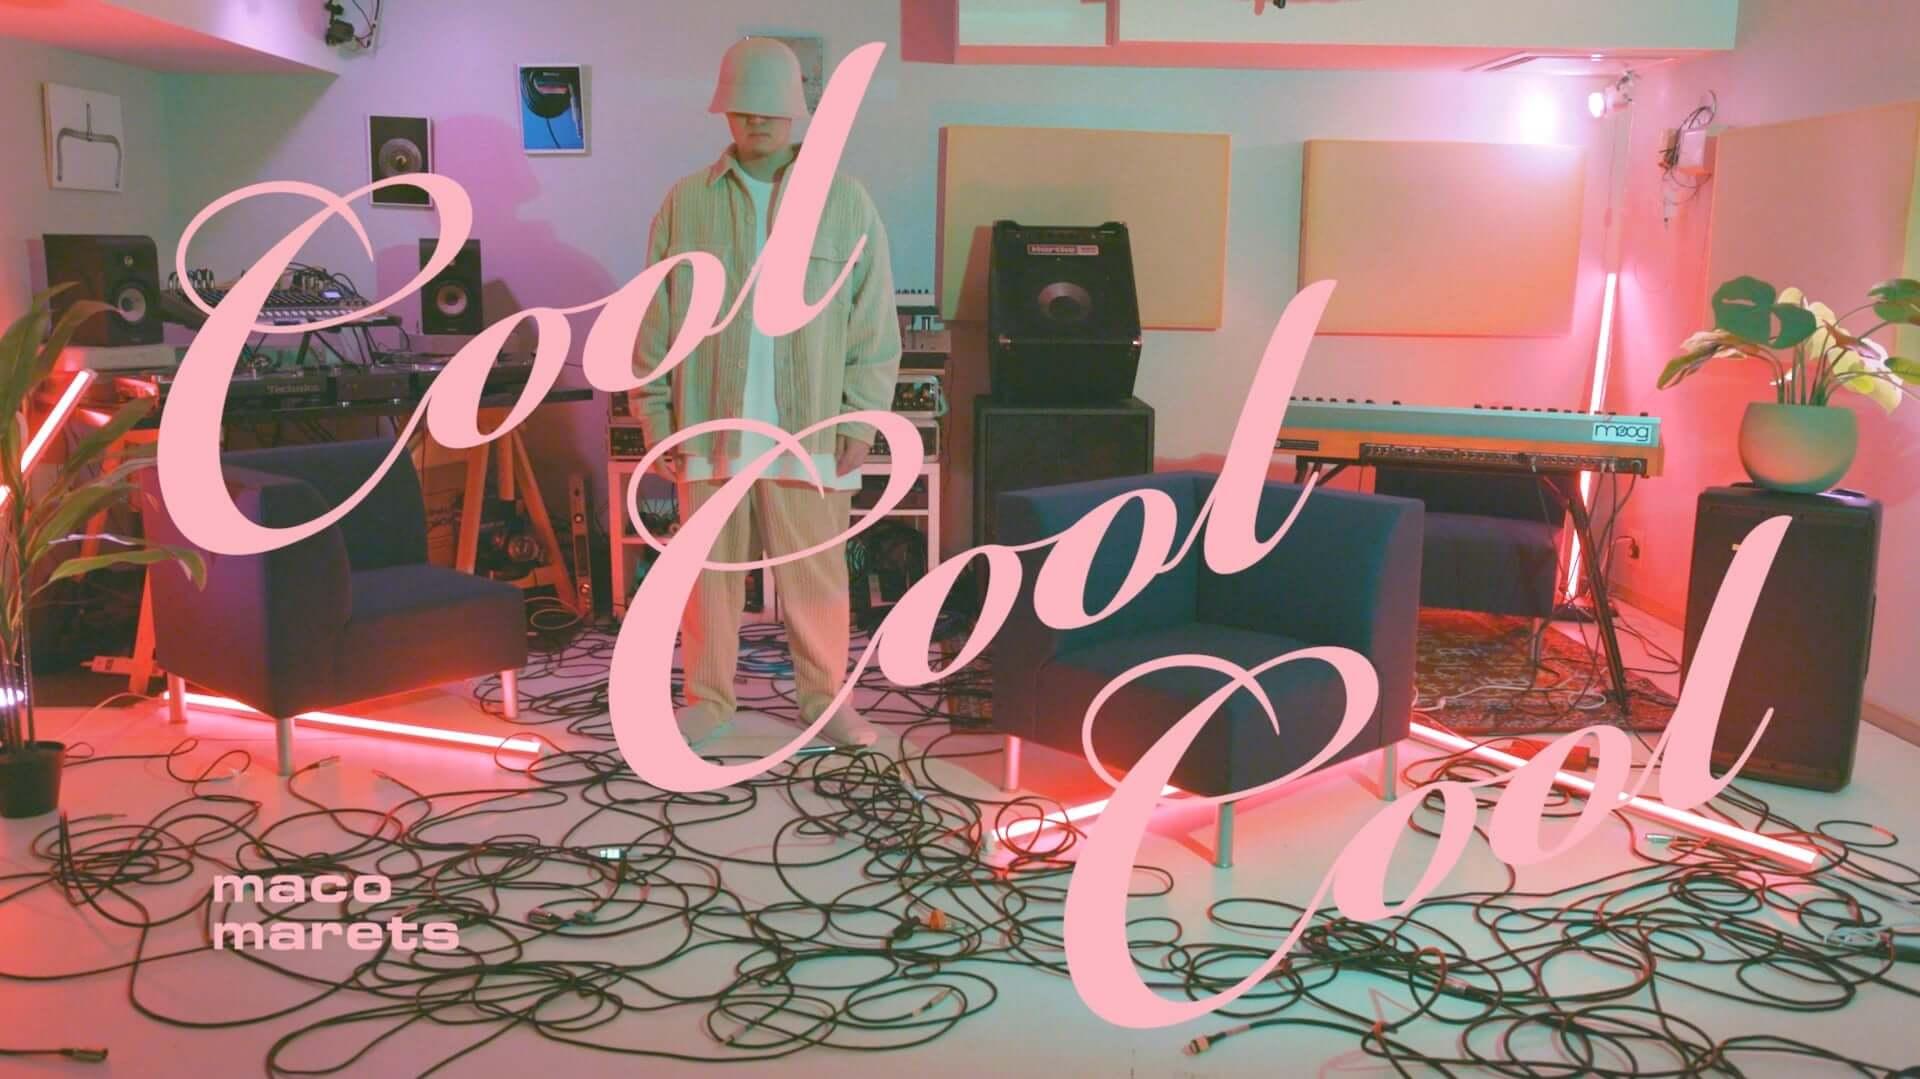 "maco maretsがOsteoleuco、TOSHIKI HAYASHI(%C)を迎えた楽曲""Cool Cool Cool""のMVを公開!新アルバム『Waterslide III』のカセットテープ版も発売 music201026_maco-marets_6-1920x1079"